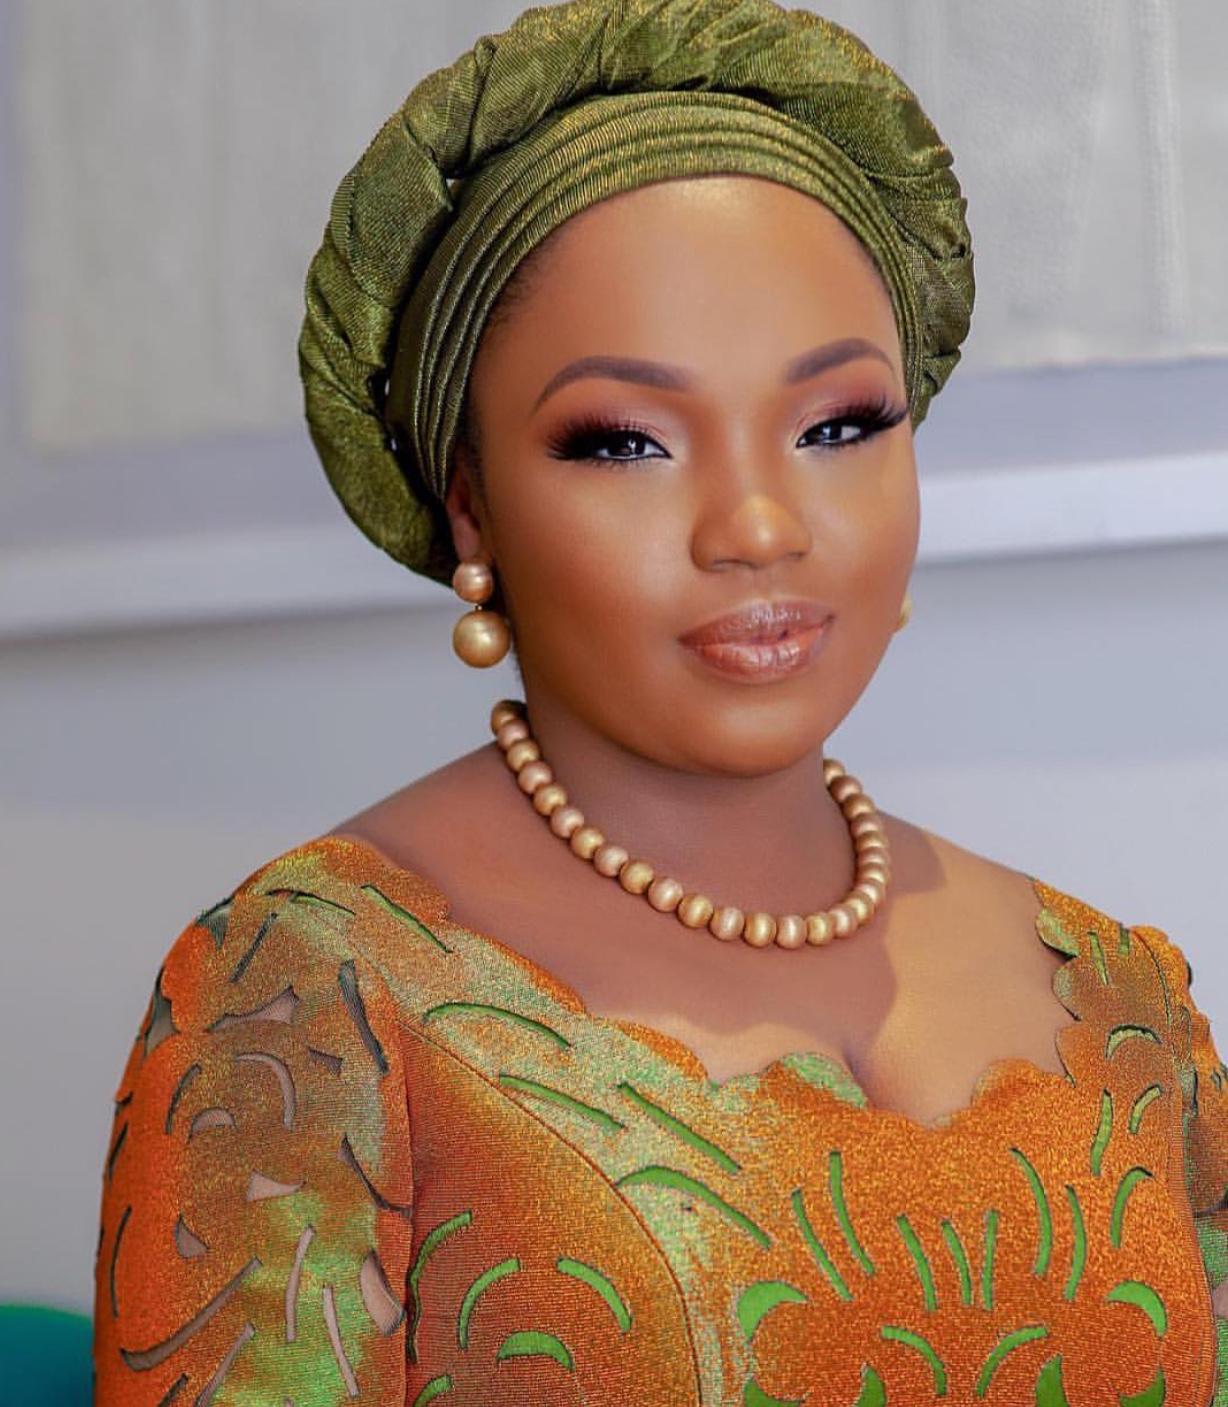 Meet Deola Sagoe Fashionista And Founder Of The House Of Deola Sagoe Mymediaafrica